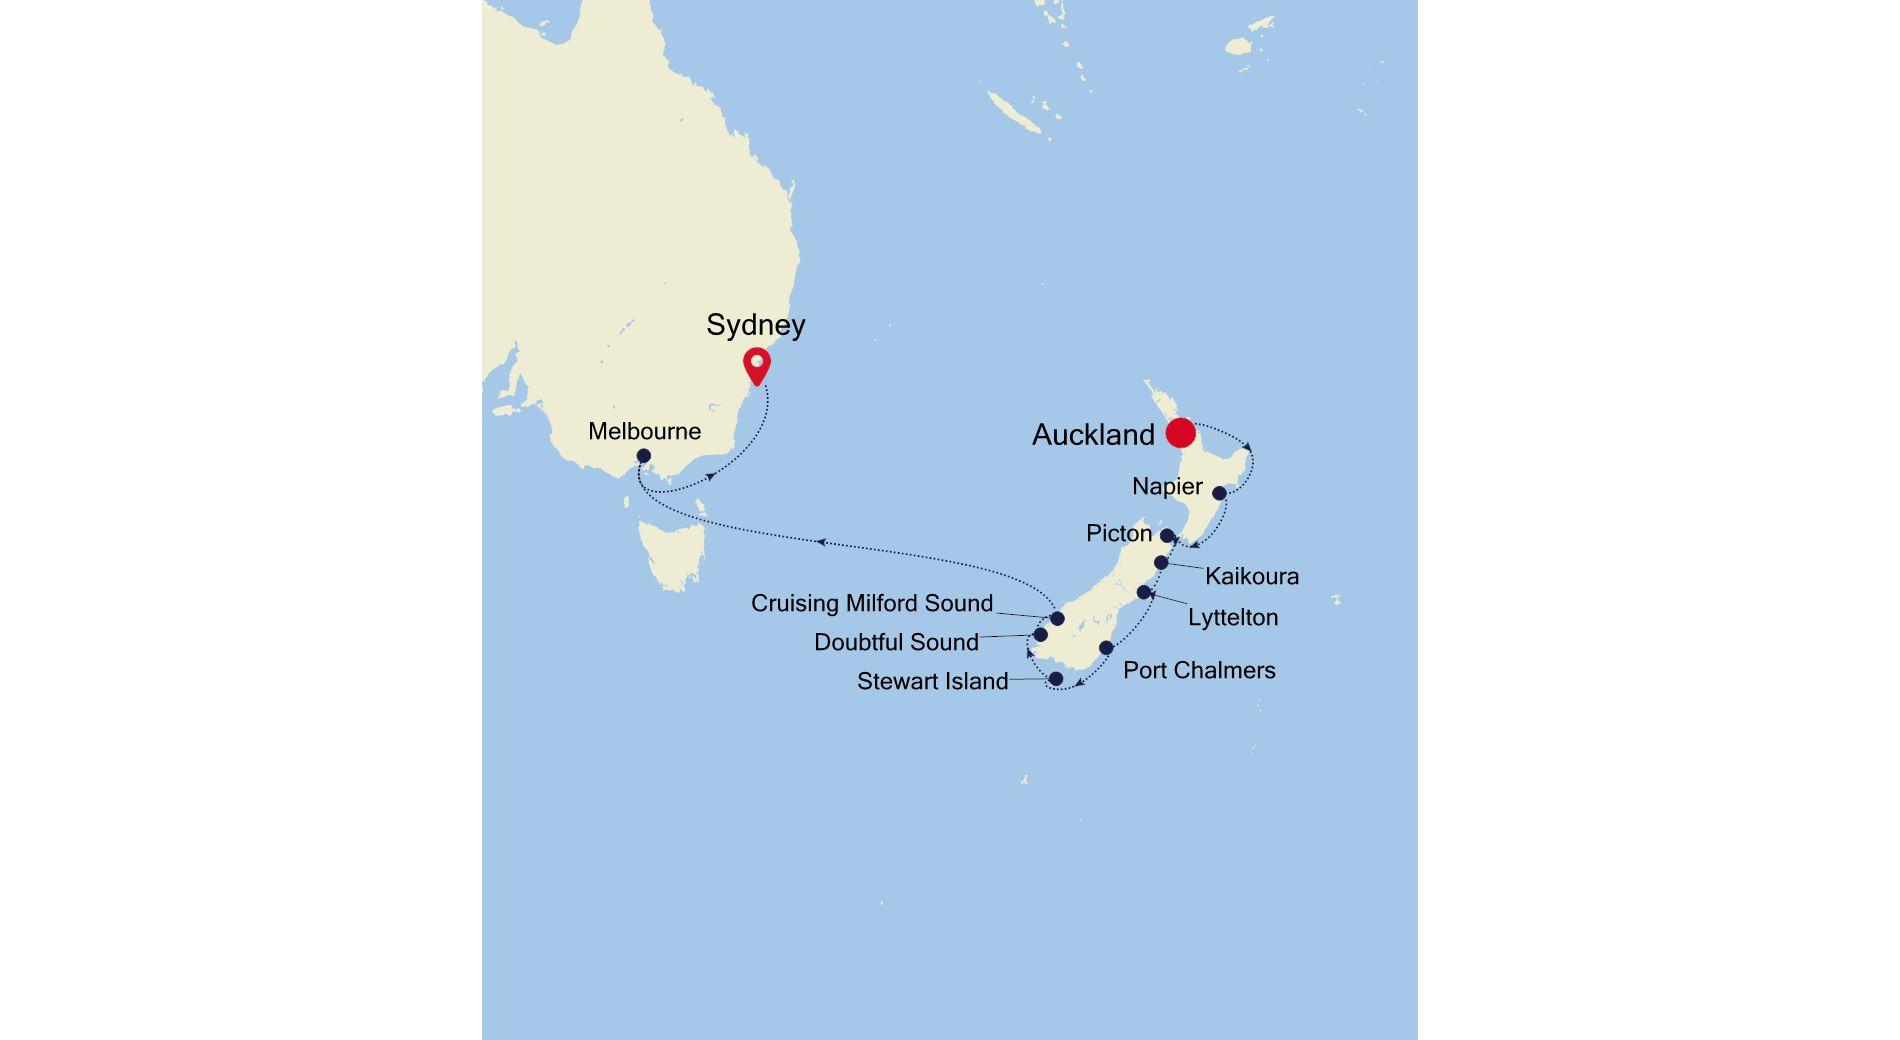 SM210105014 - Auckland to Sydney